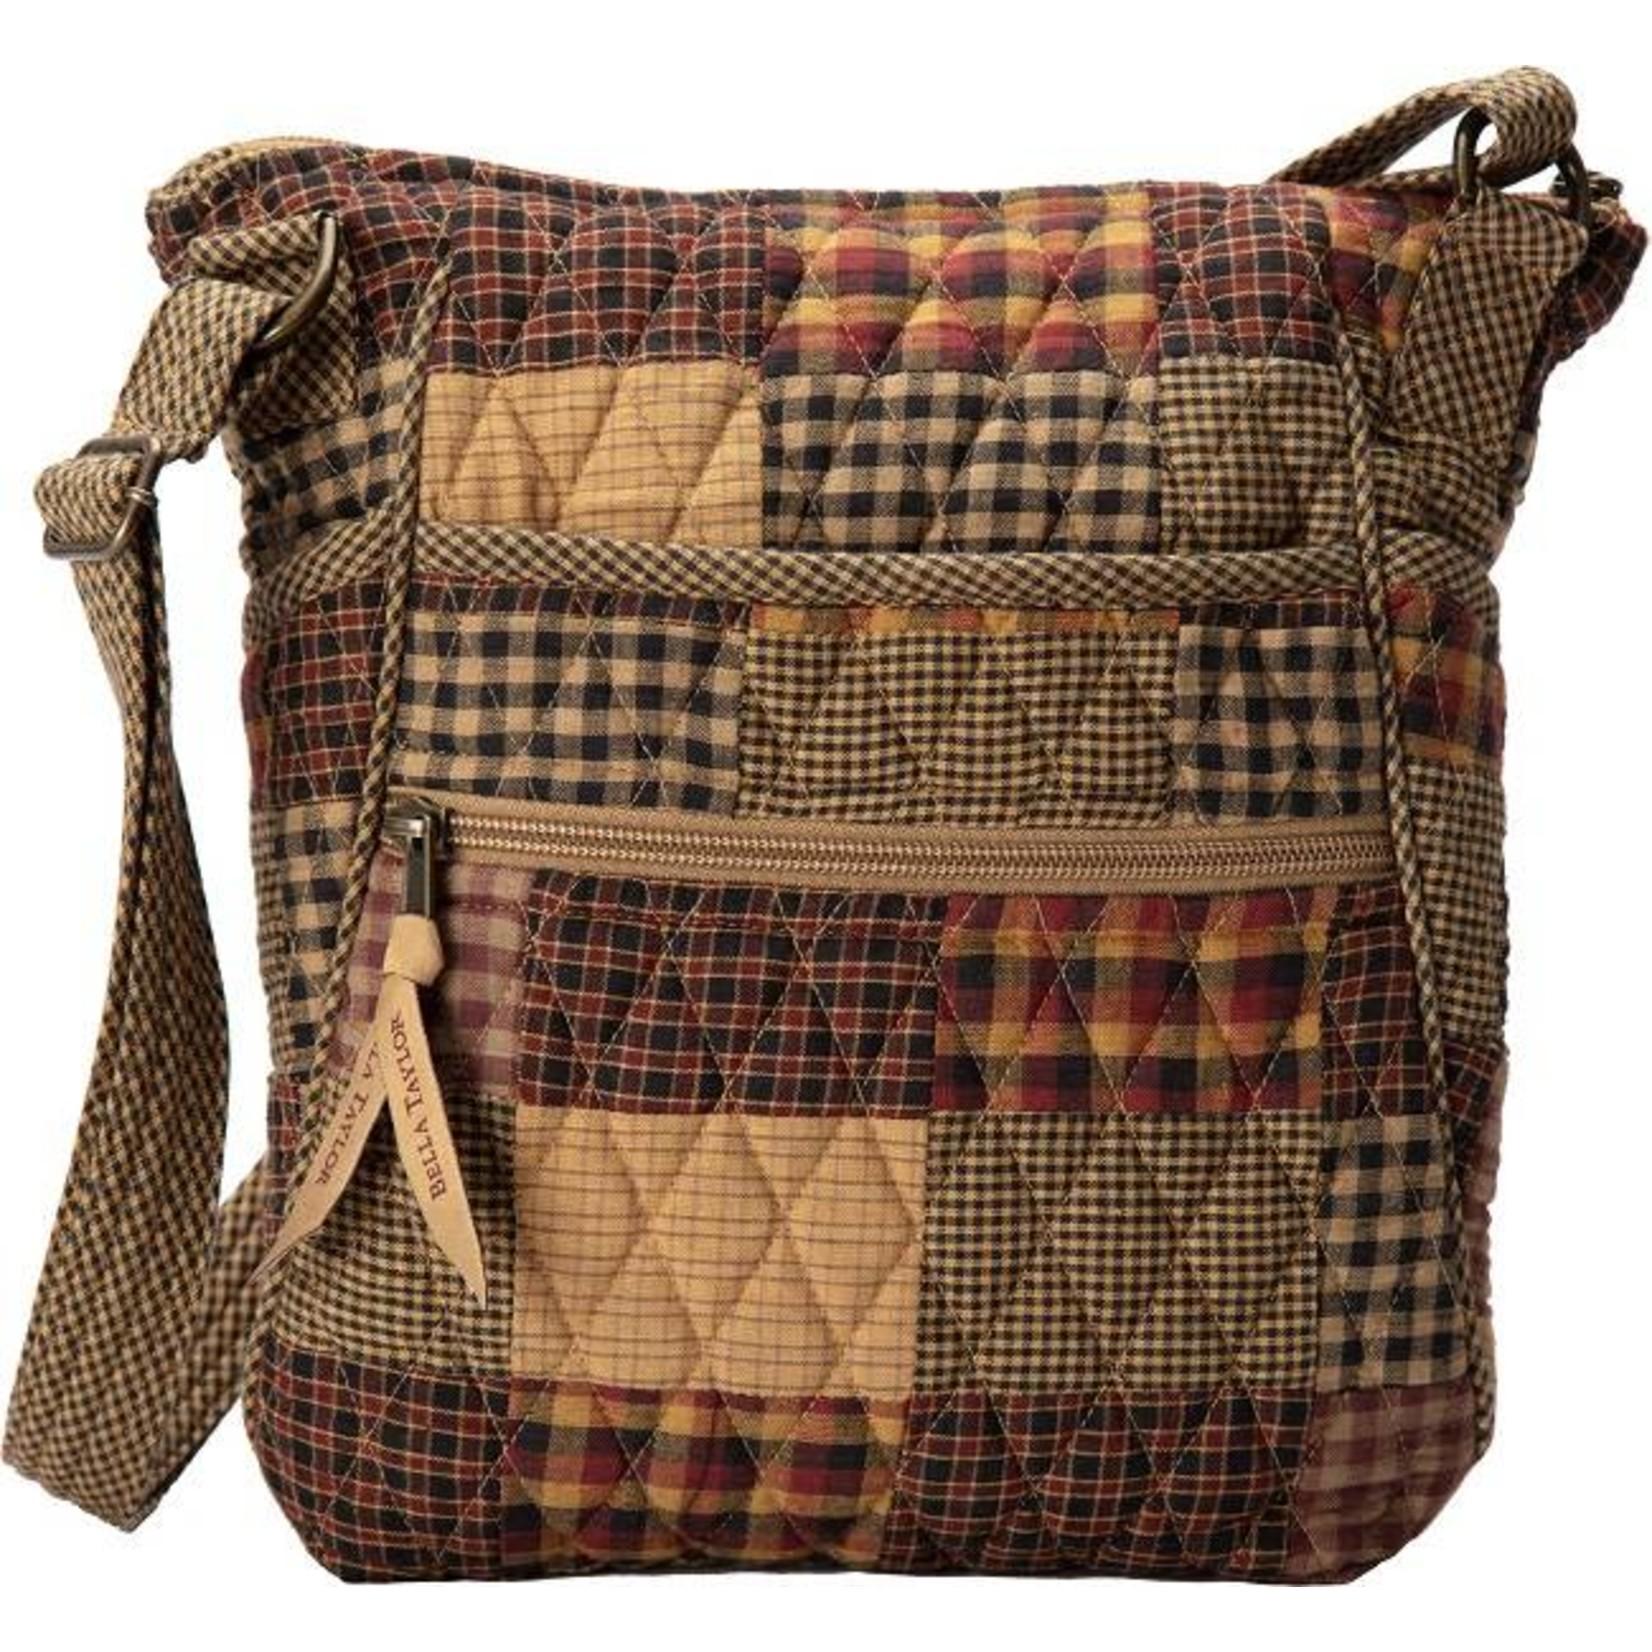 Bella Taylor Heritage - Hipster handbag